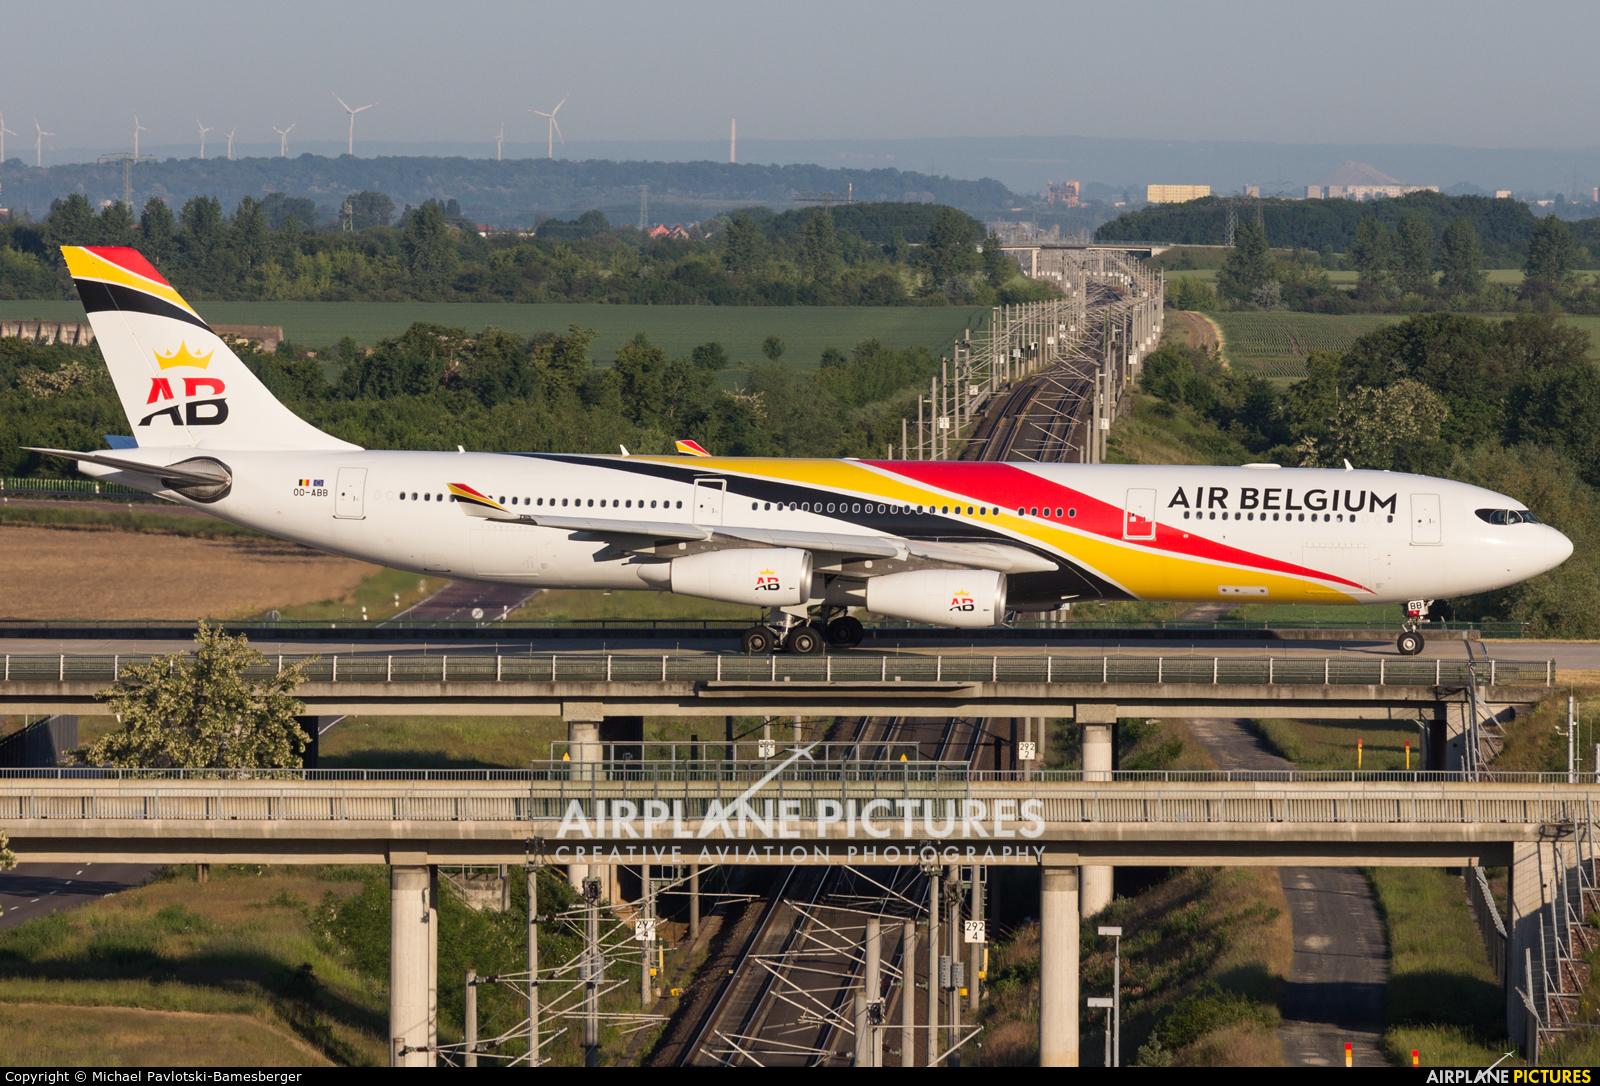 Air Belgium OO-ABB aircraft at Leipzig - Halle